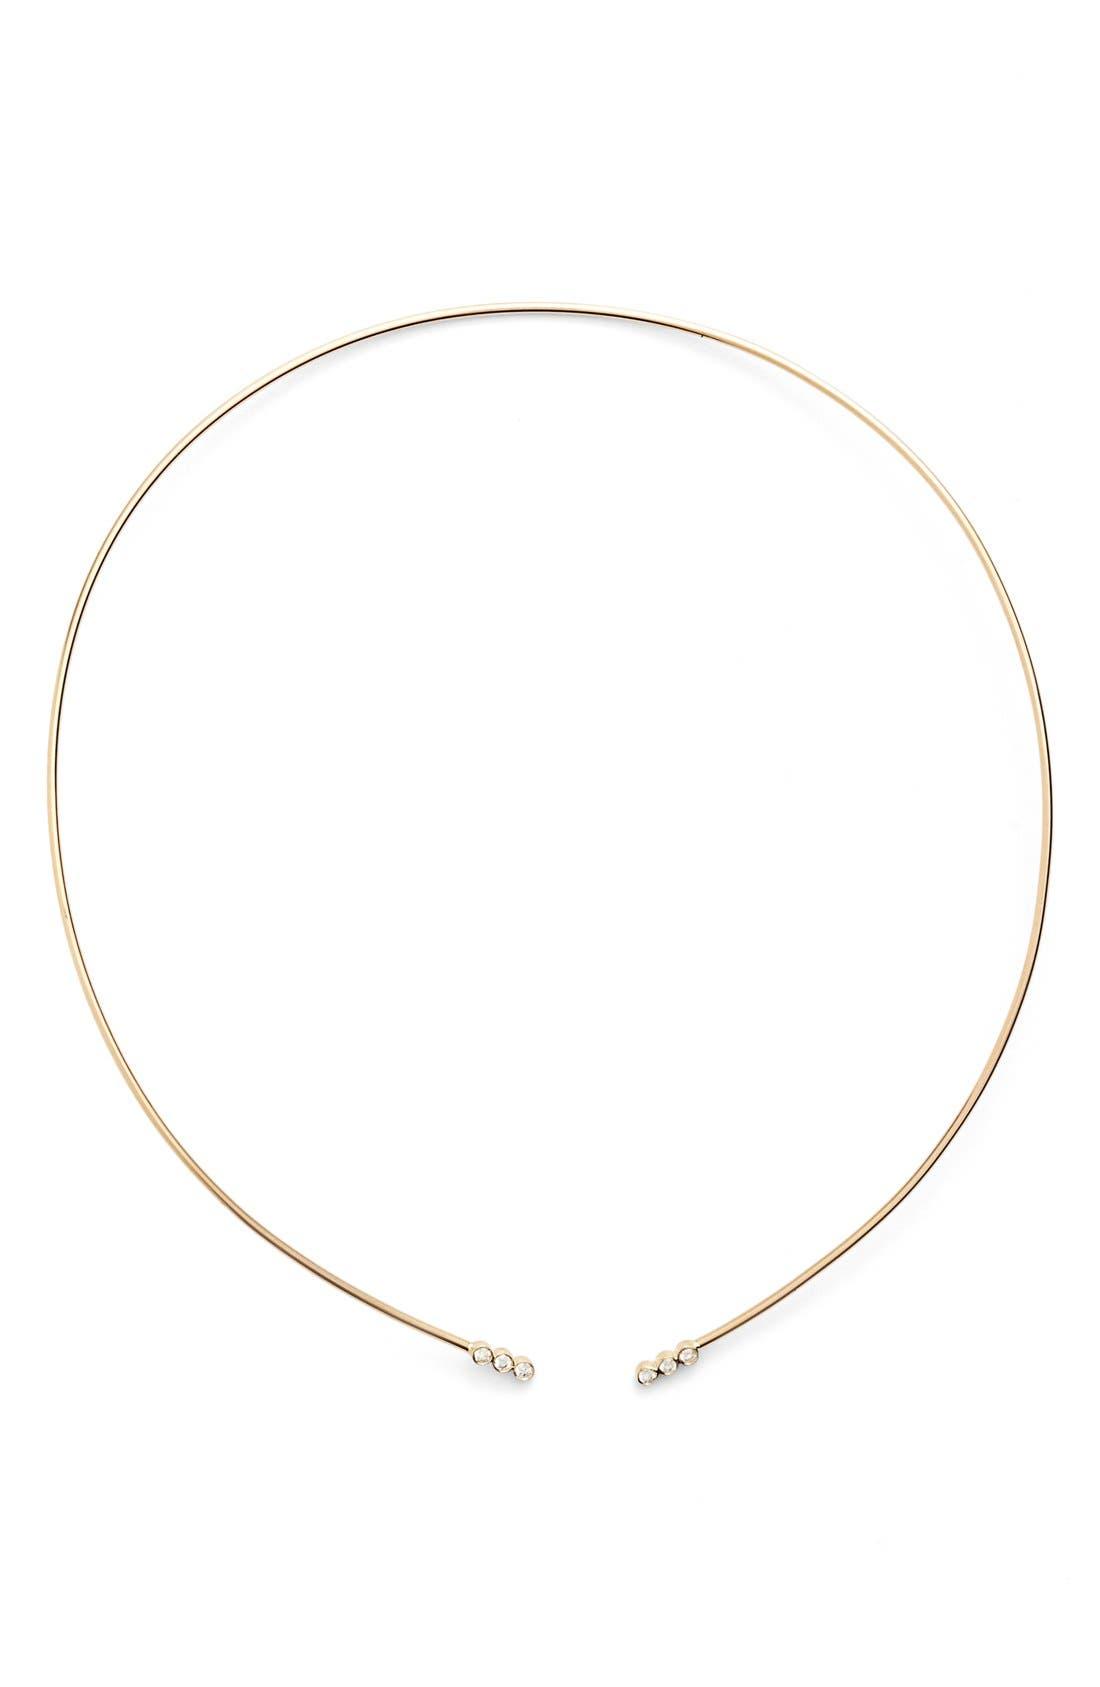 Diamond Collar Necklace,                         Main,                         color, Yellow Gold